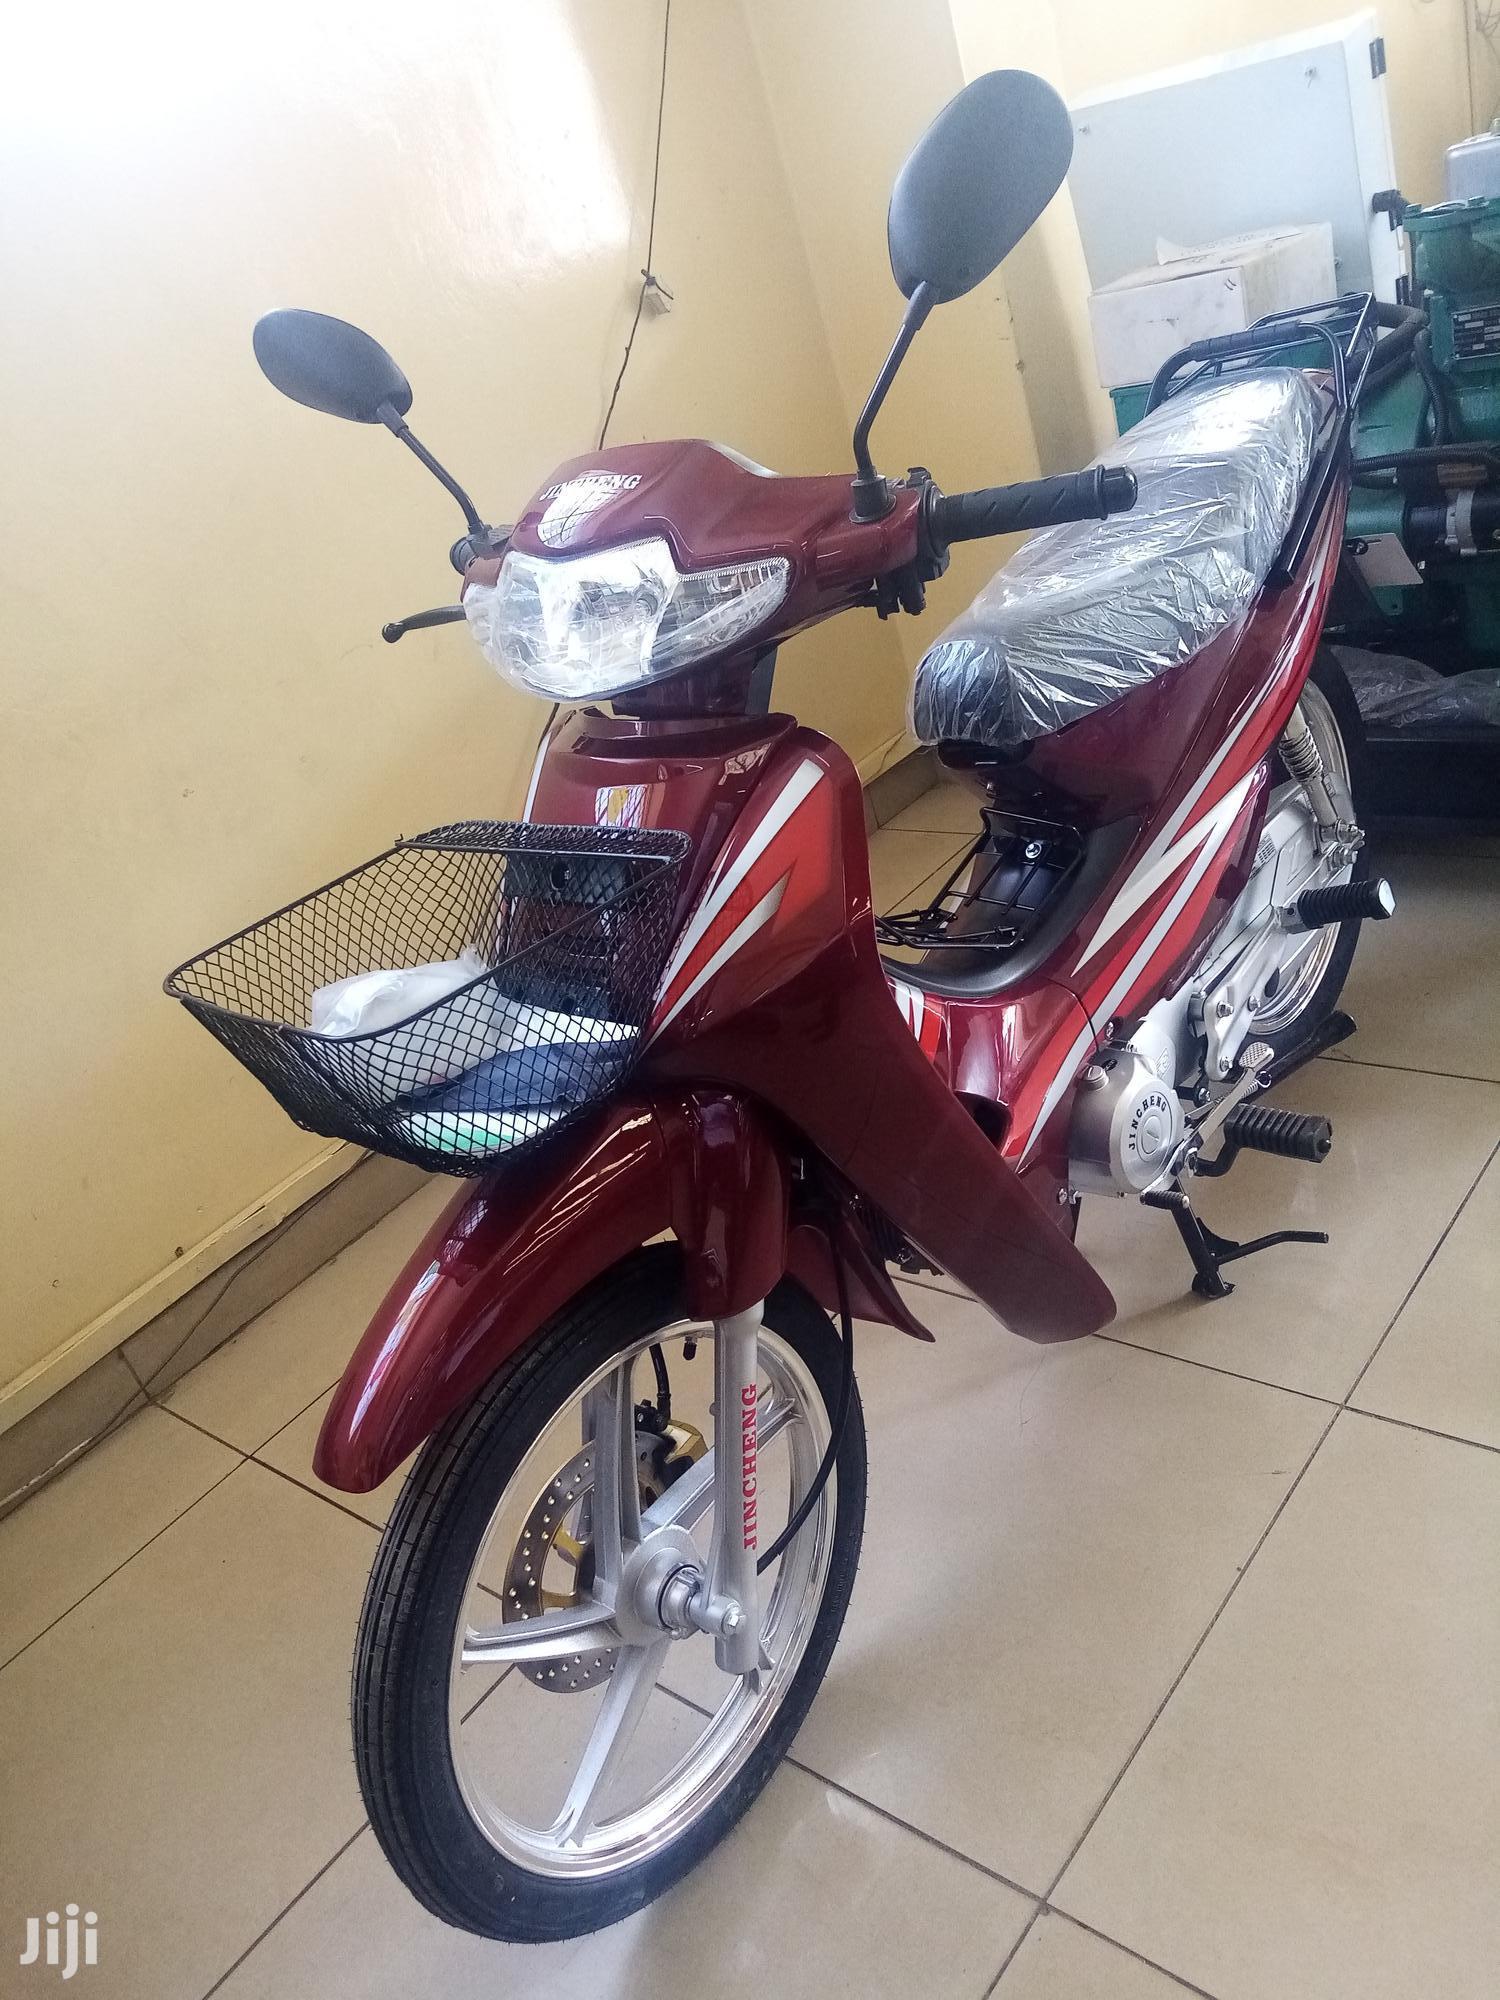 New Jincheng 2019 | Motorcycles & Scooters for sale in Landimawe, Nairobi, Kenya